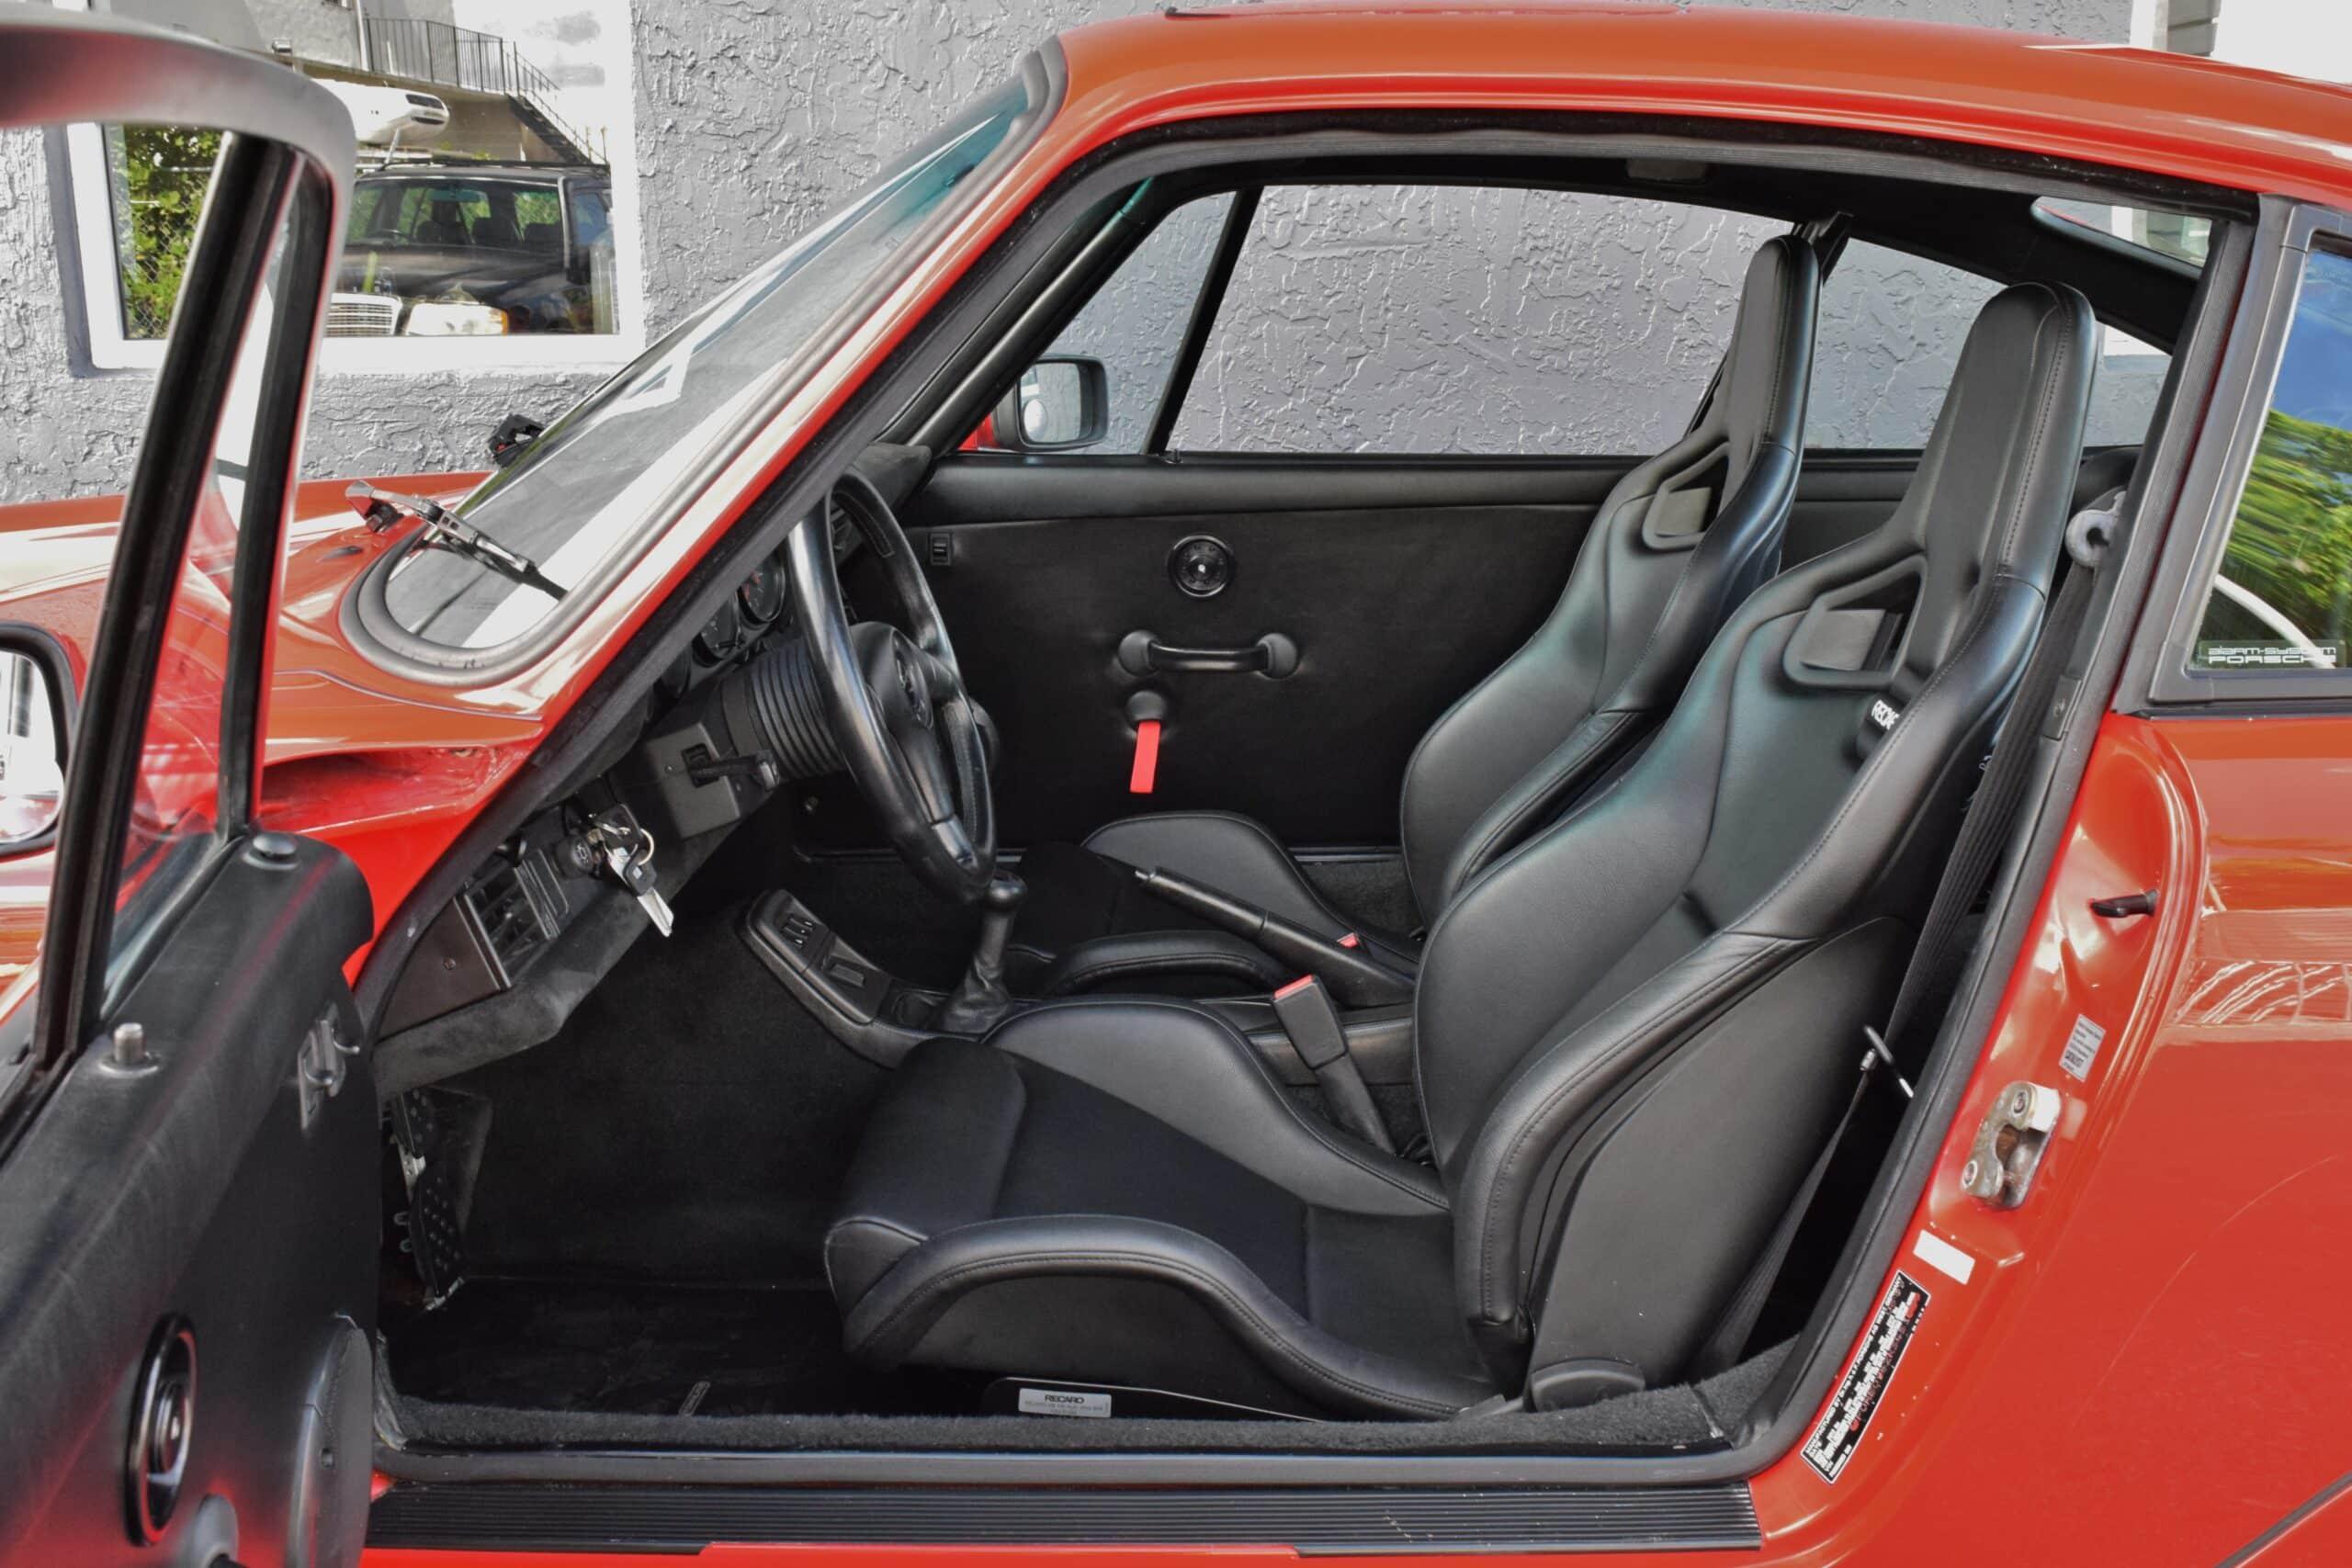 1989 Porsche 911 Carrera 4 964 SHOW CAR-BBS RS- Recaro Seats-H&R Coilovers $53,000 Reciepts – Engine Refresh